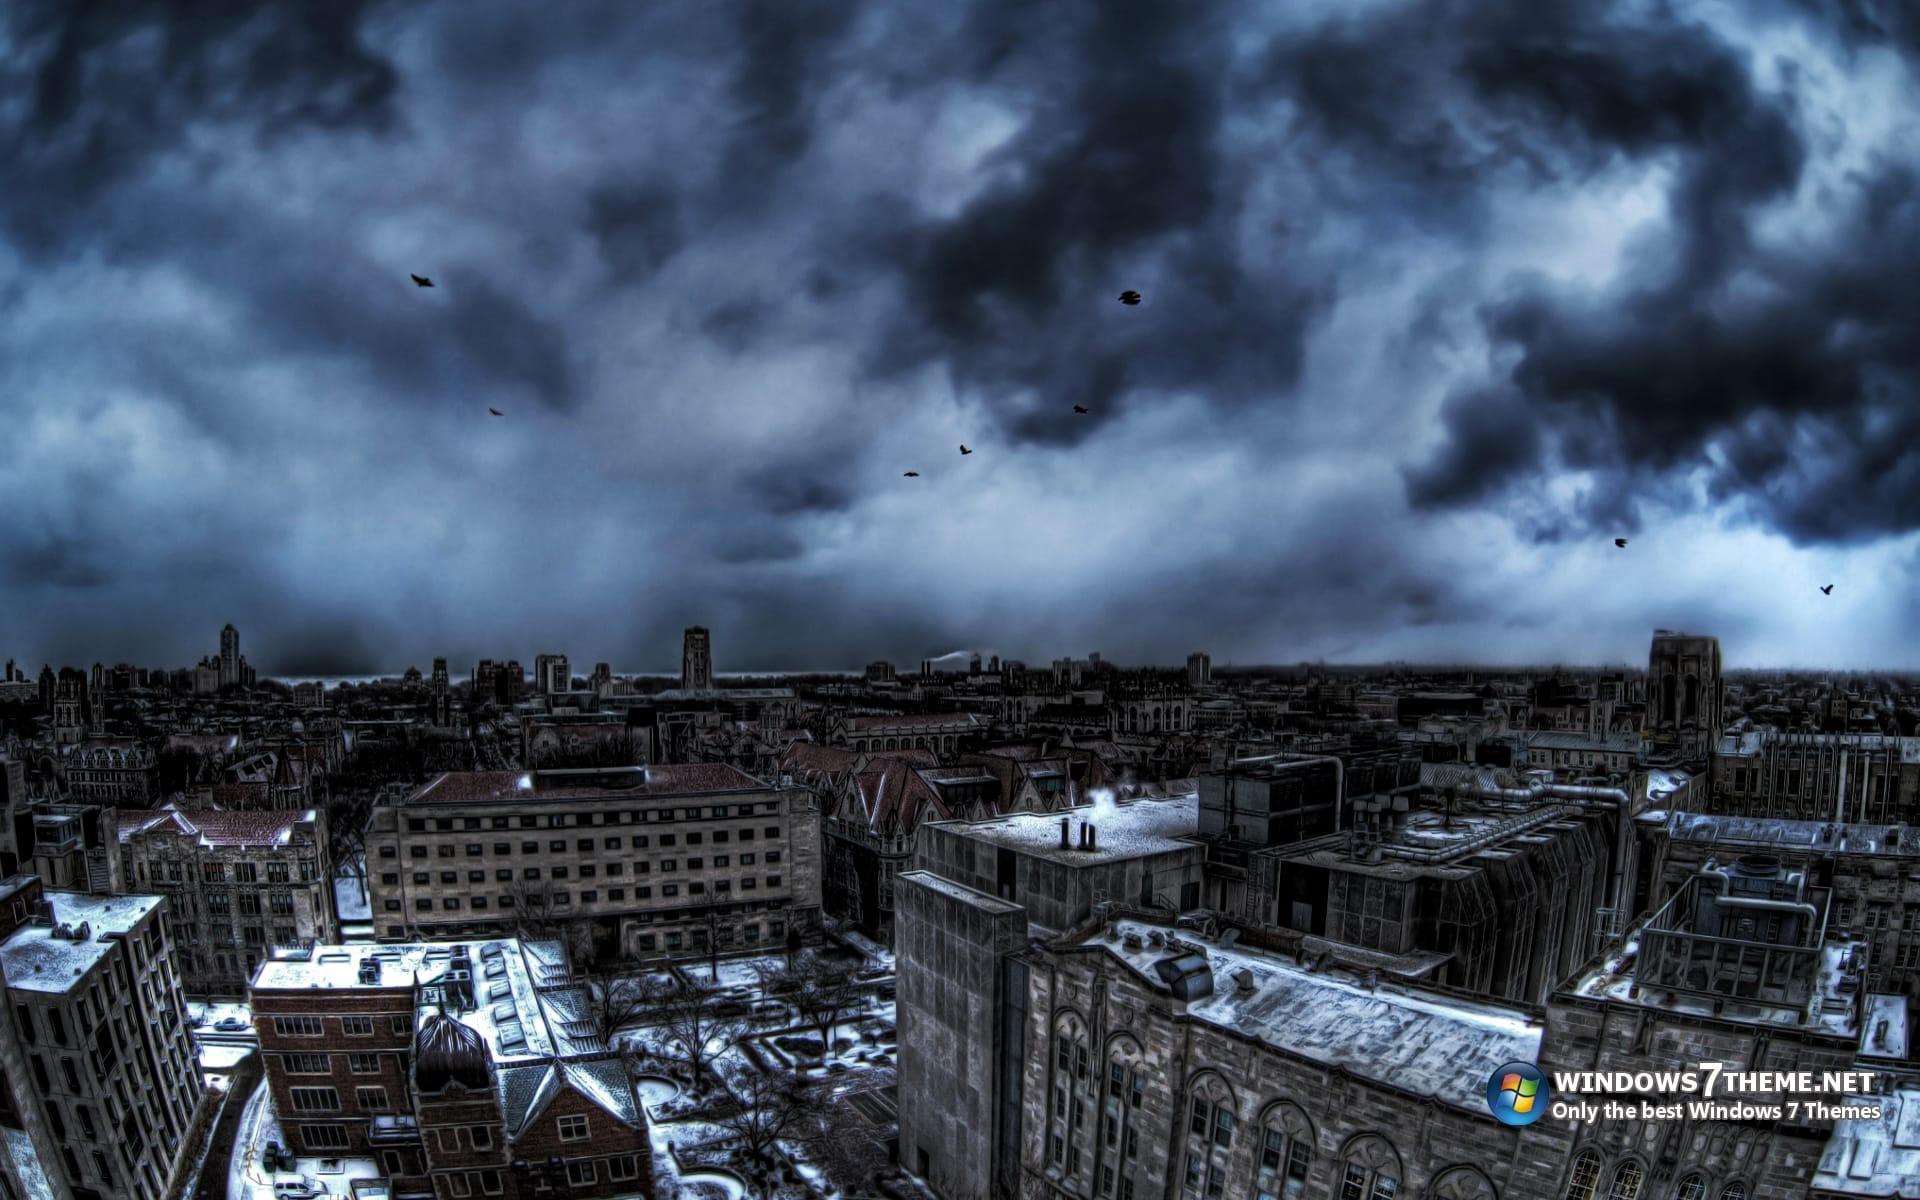 Storm Windows 7 Theme